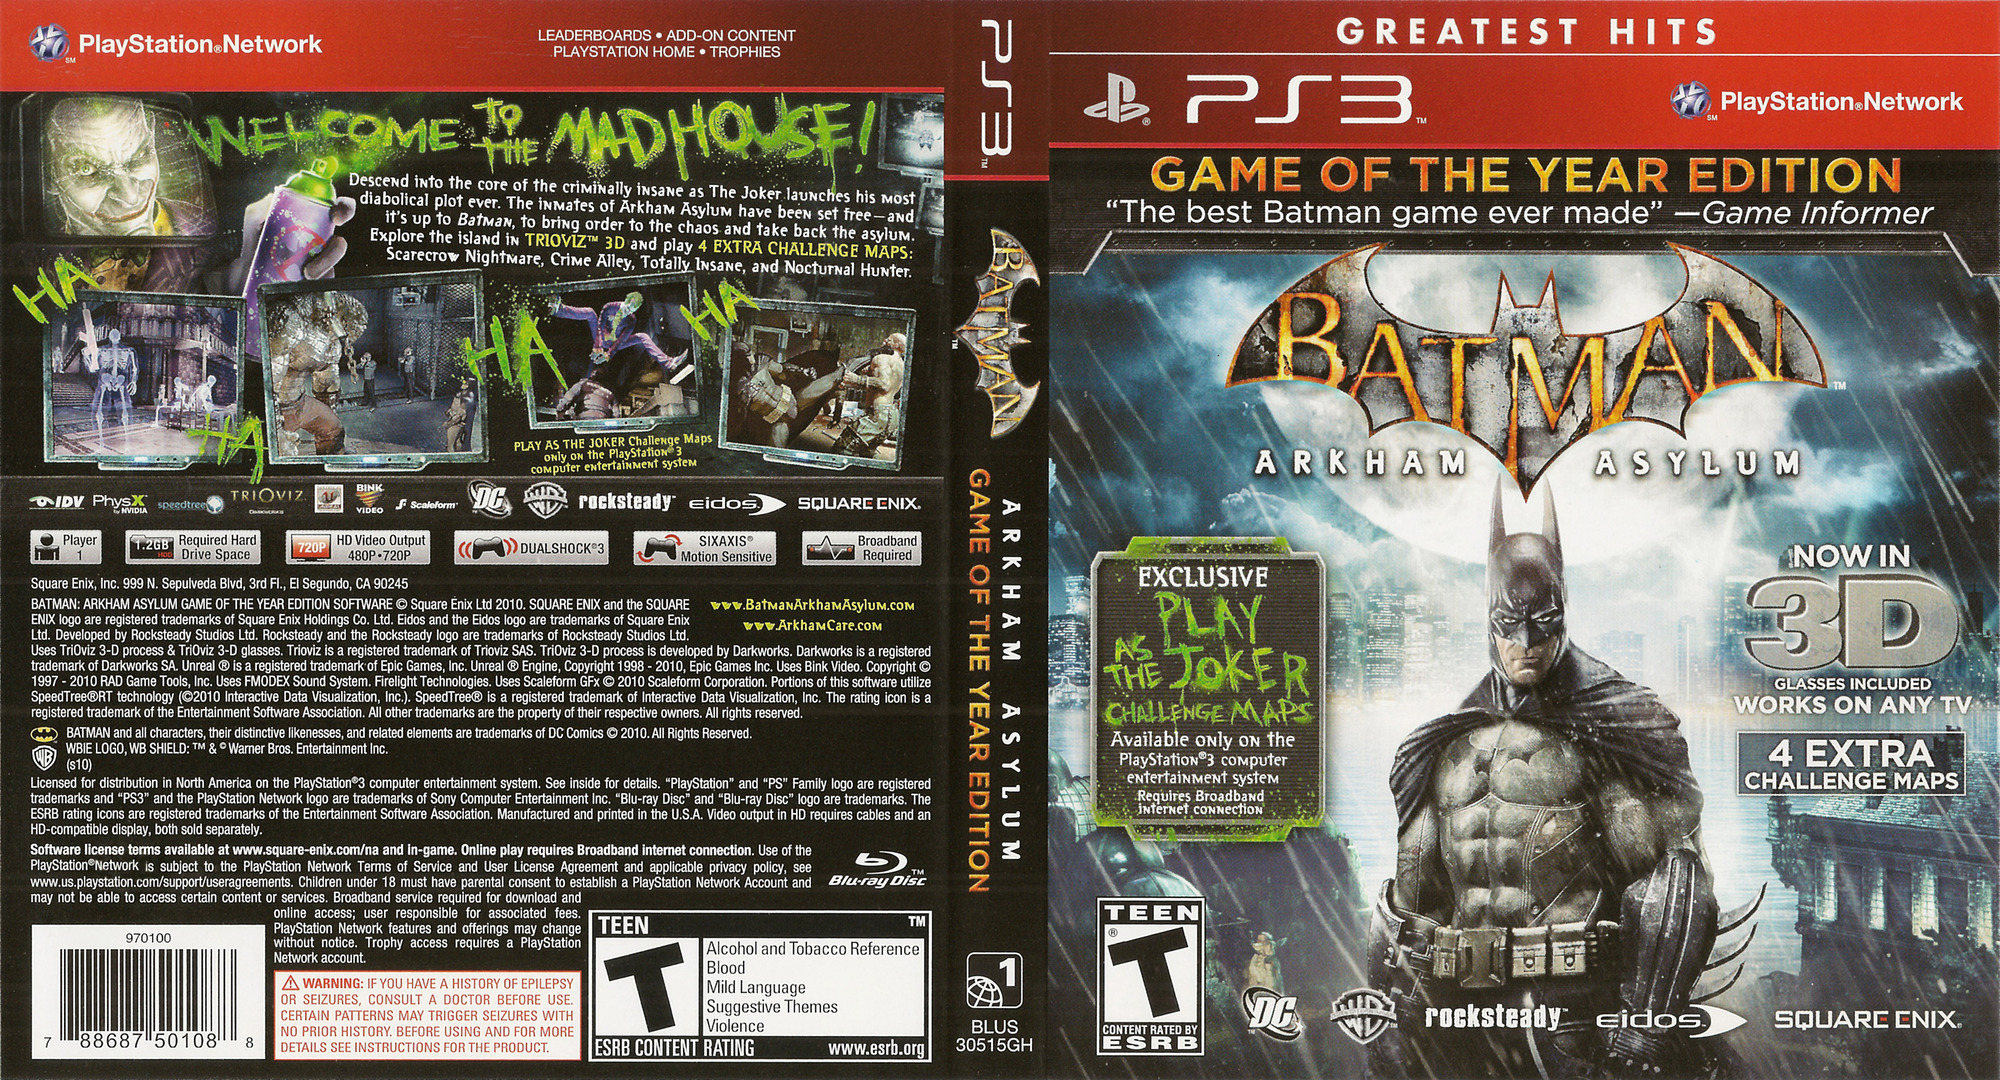 Batman: Arkham Asylum (Game of the Year Edition) PS3 coverfullHQ (BLUS30515)